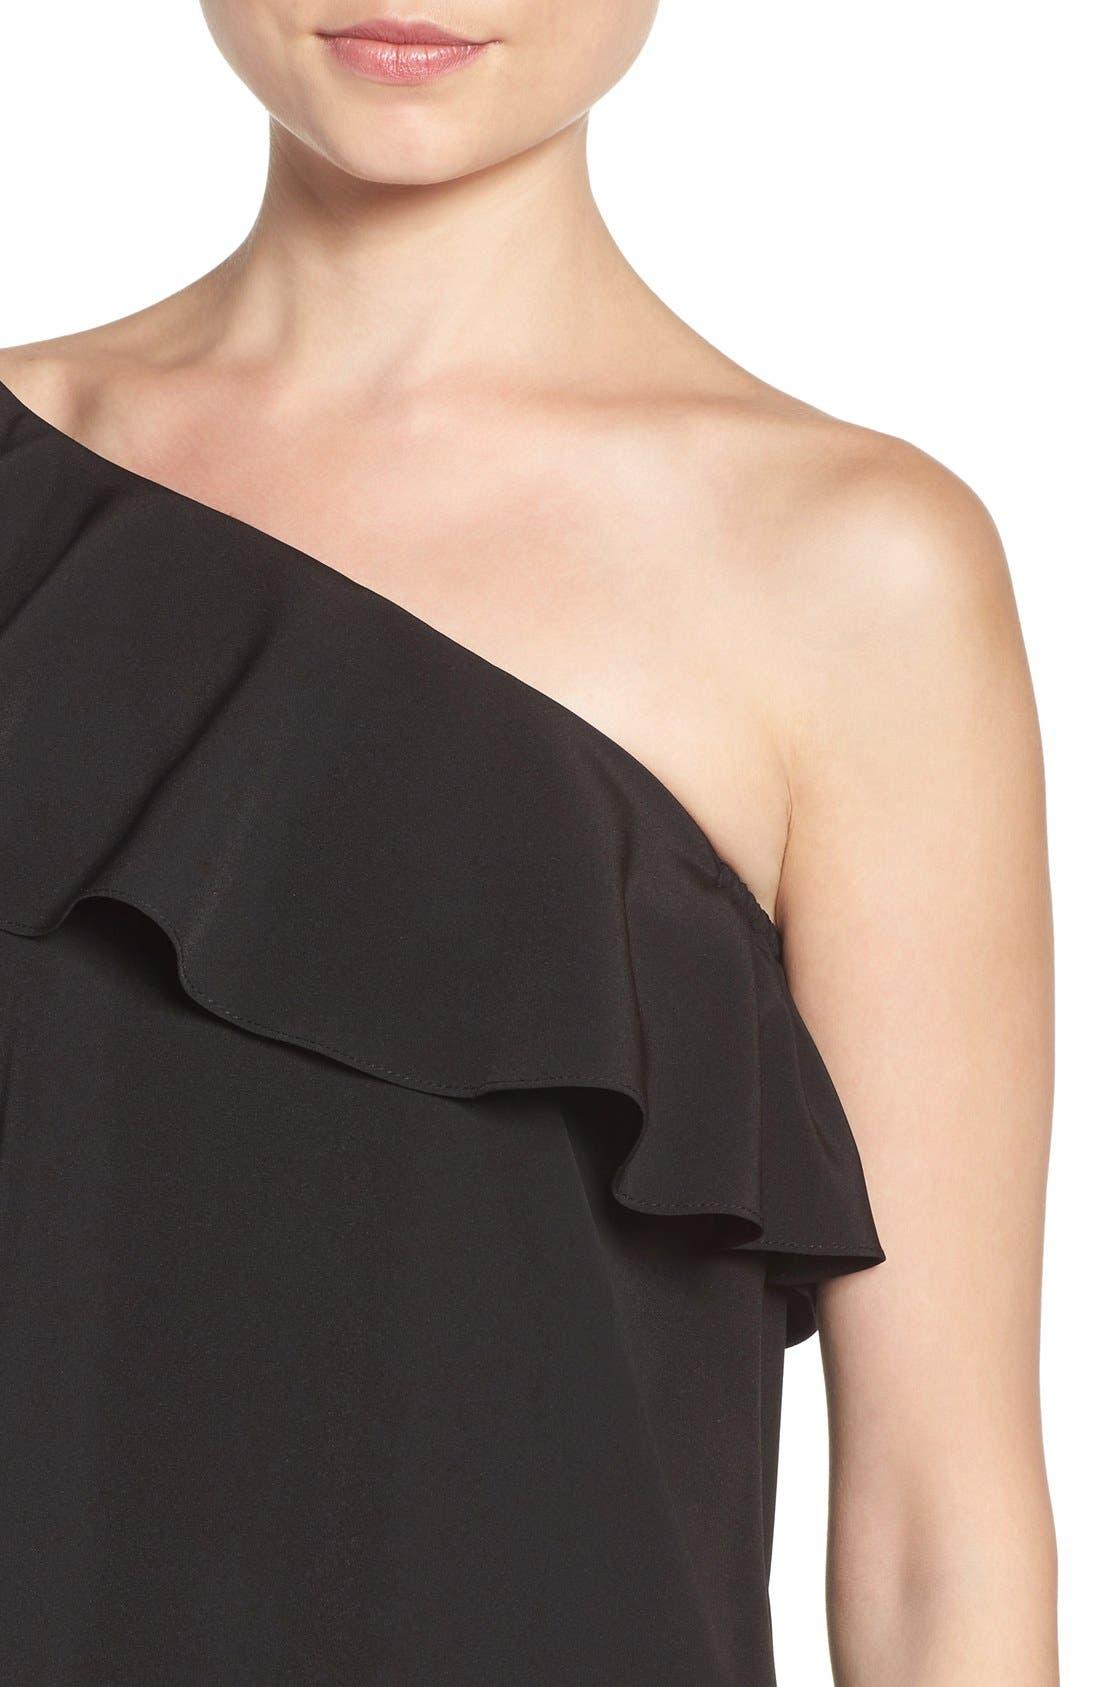 A BY AMANDA,                             Luella One-Shoulder Dress,                             Alternate thumbnail 5, color,                             001